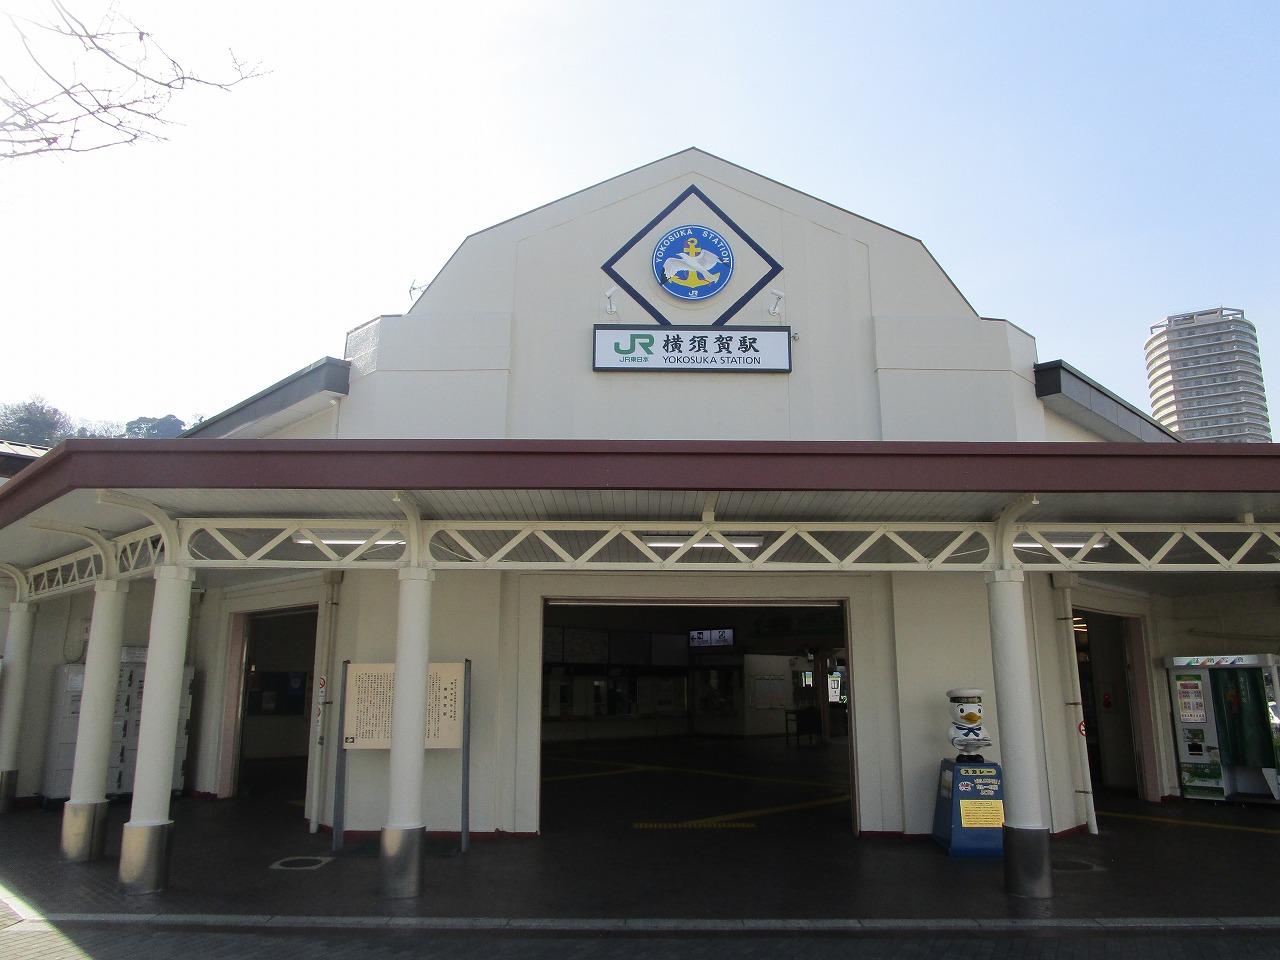 JR線も利用可能で横浜方面へのアクセス良好♪